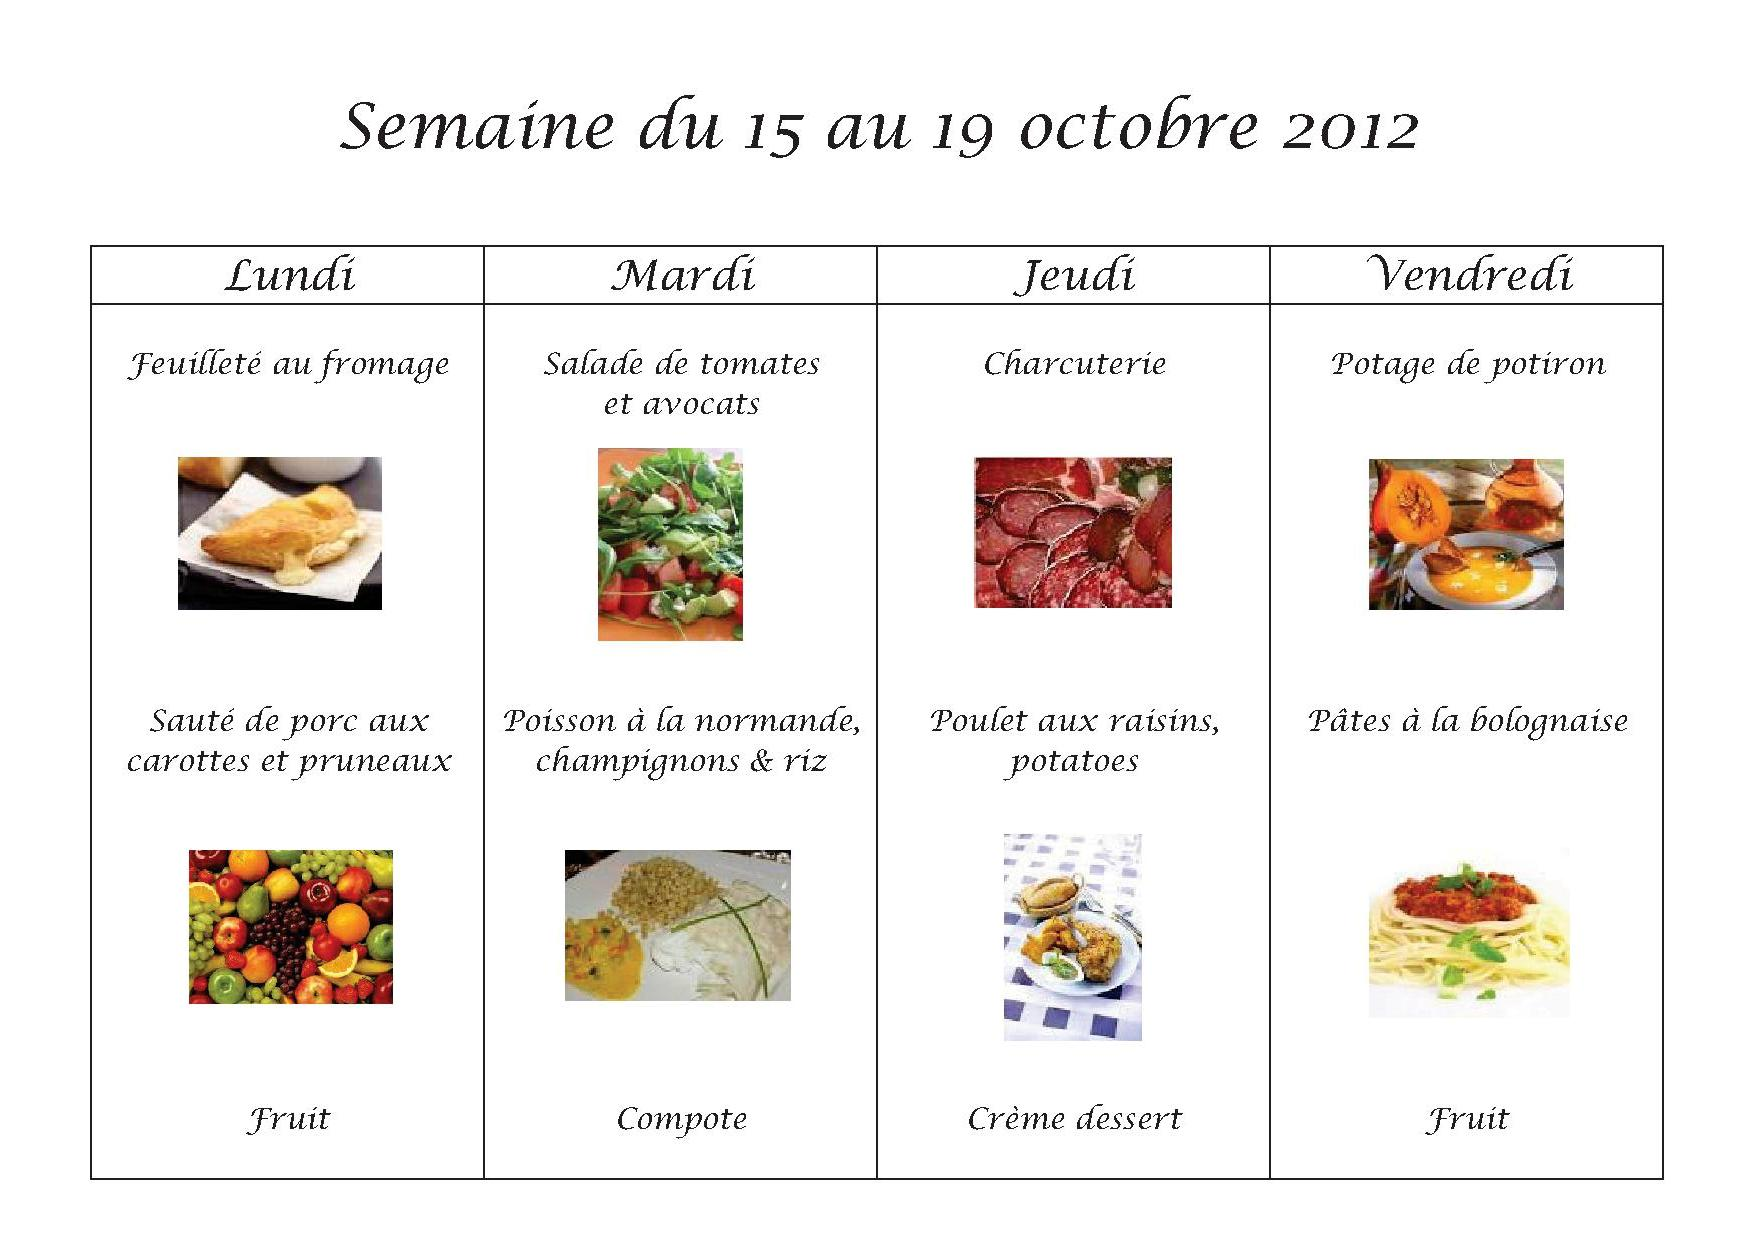 Menus du 15 au 19 octobre 2012